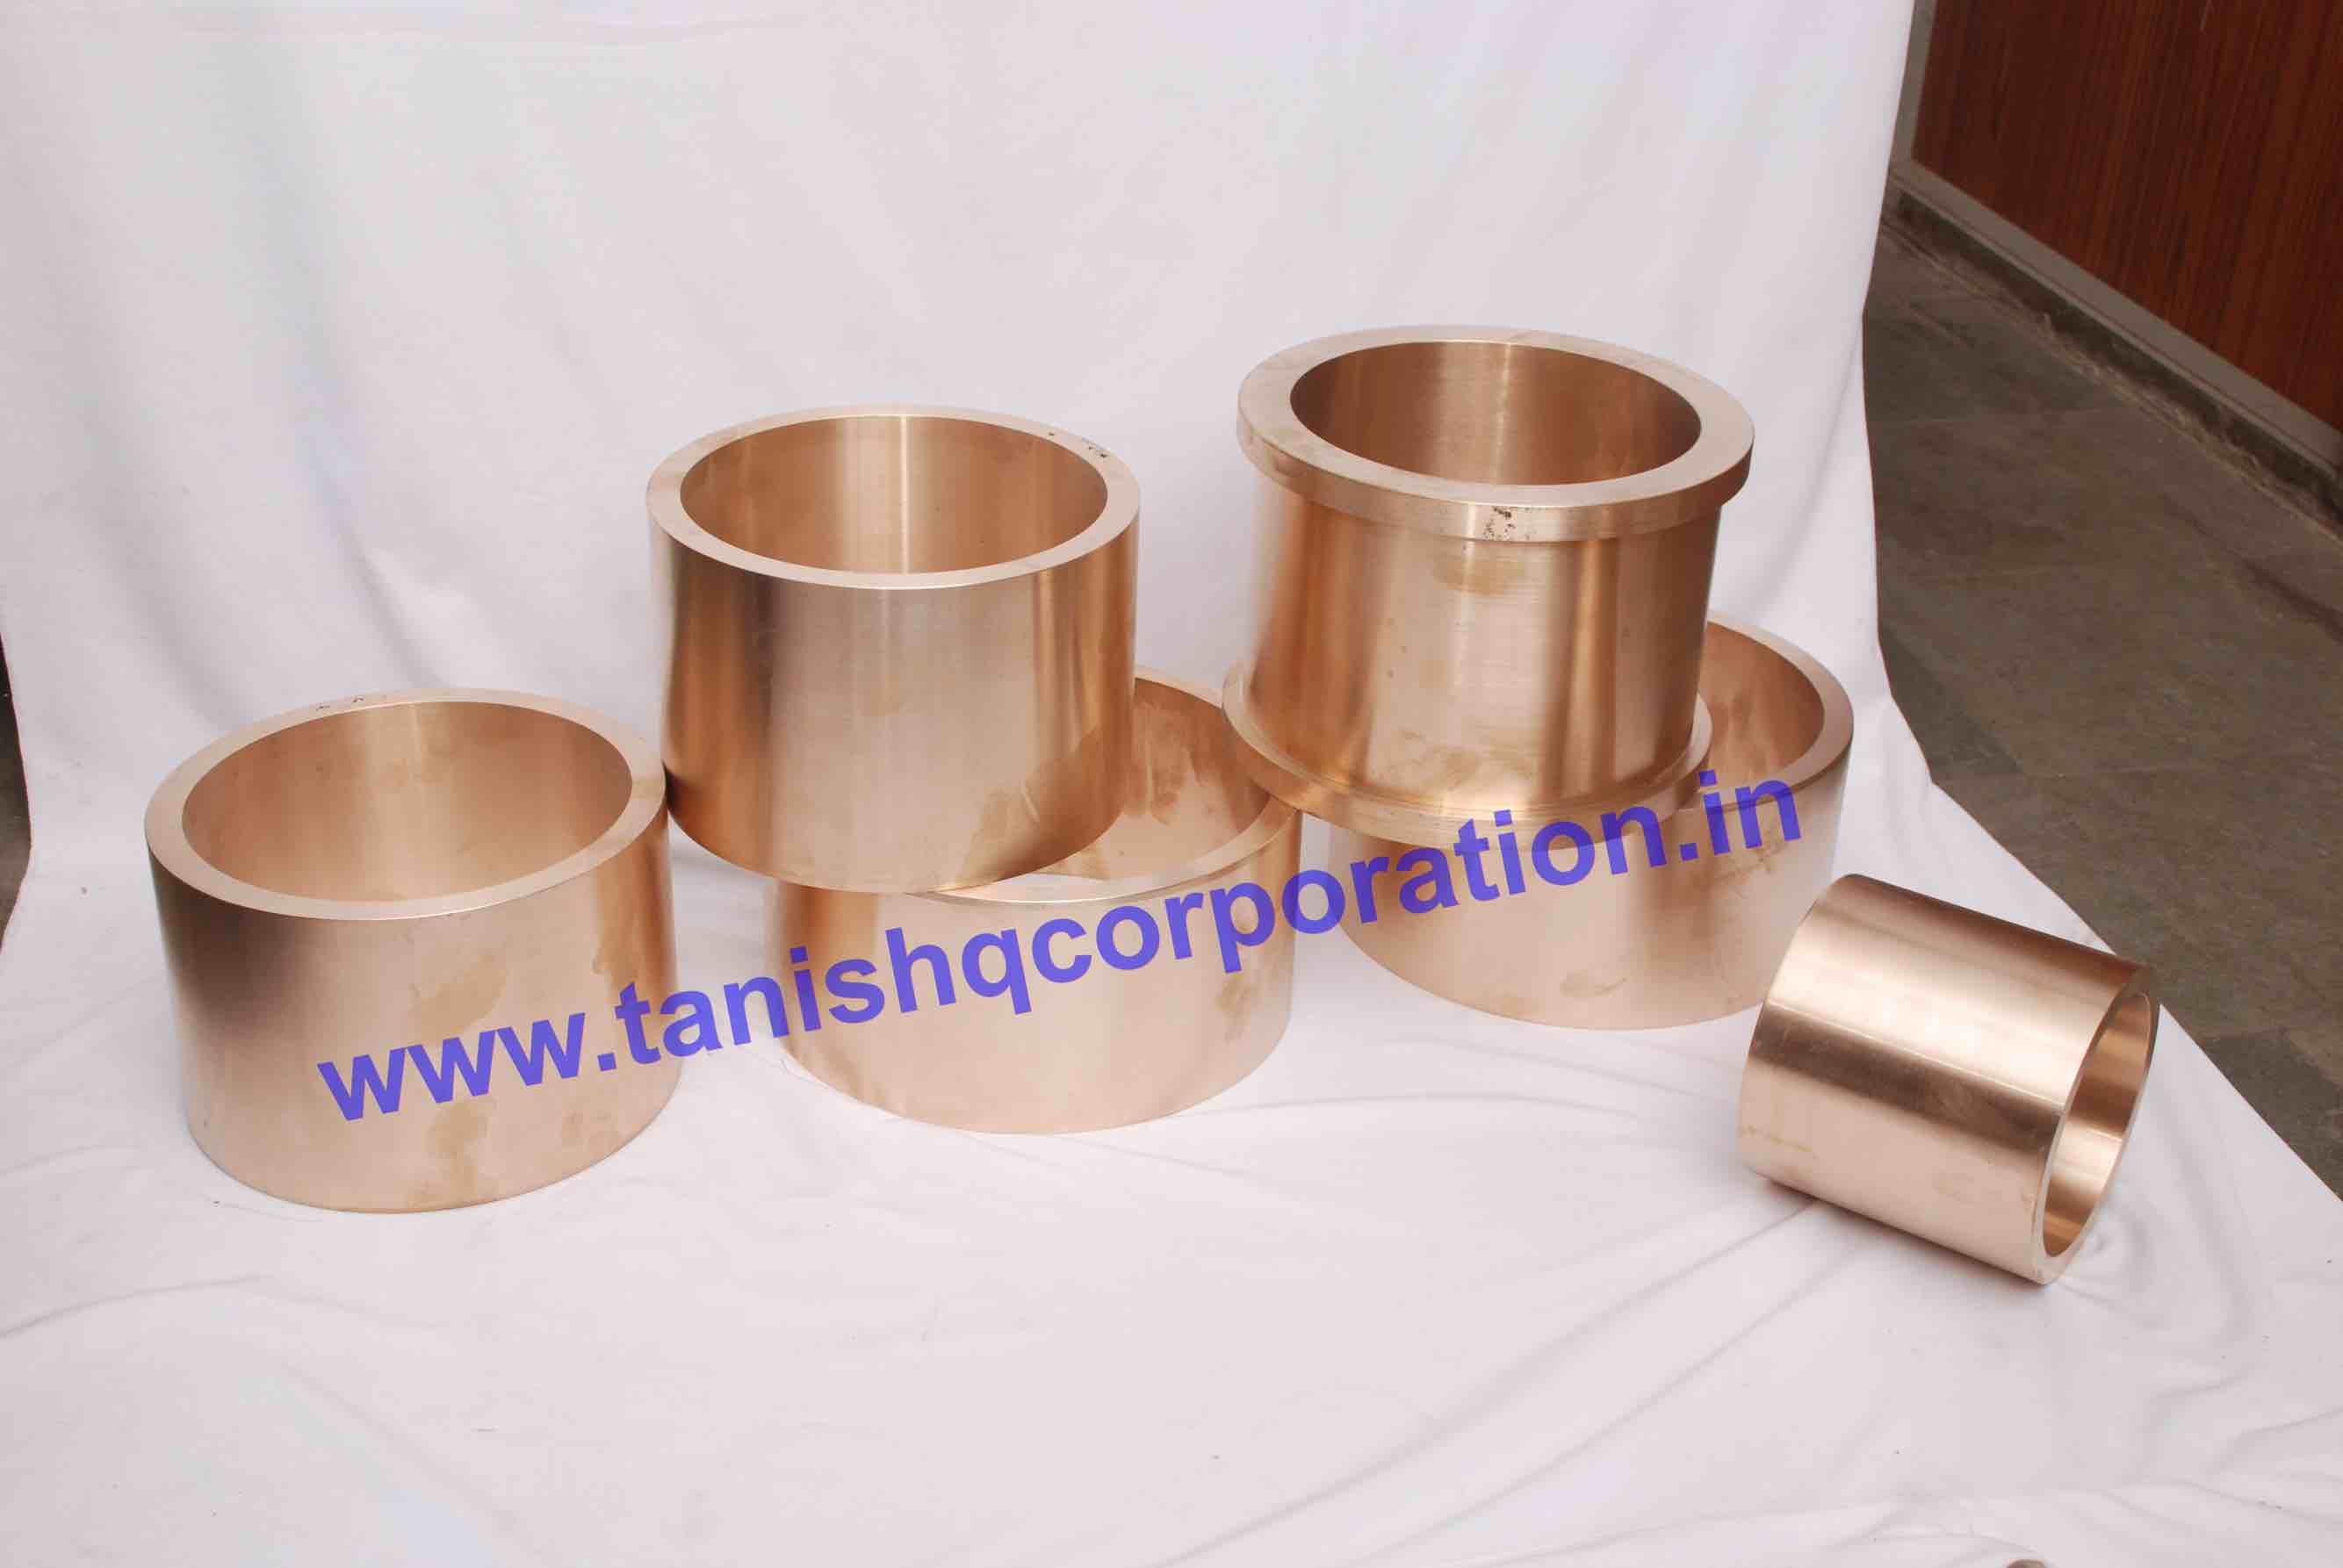 Tanishq Corporation